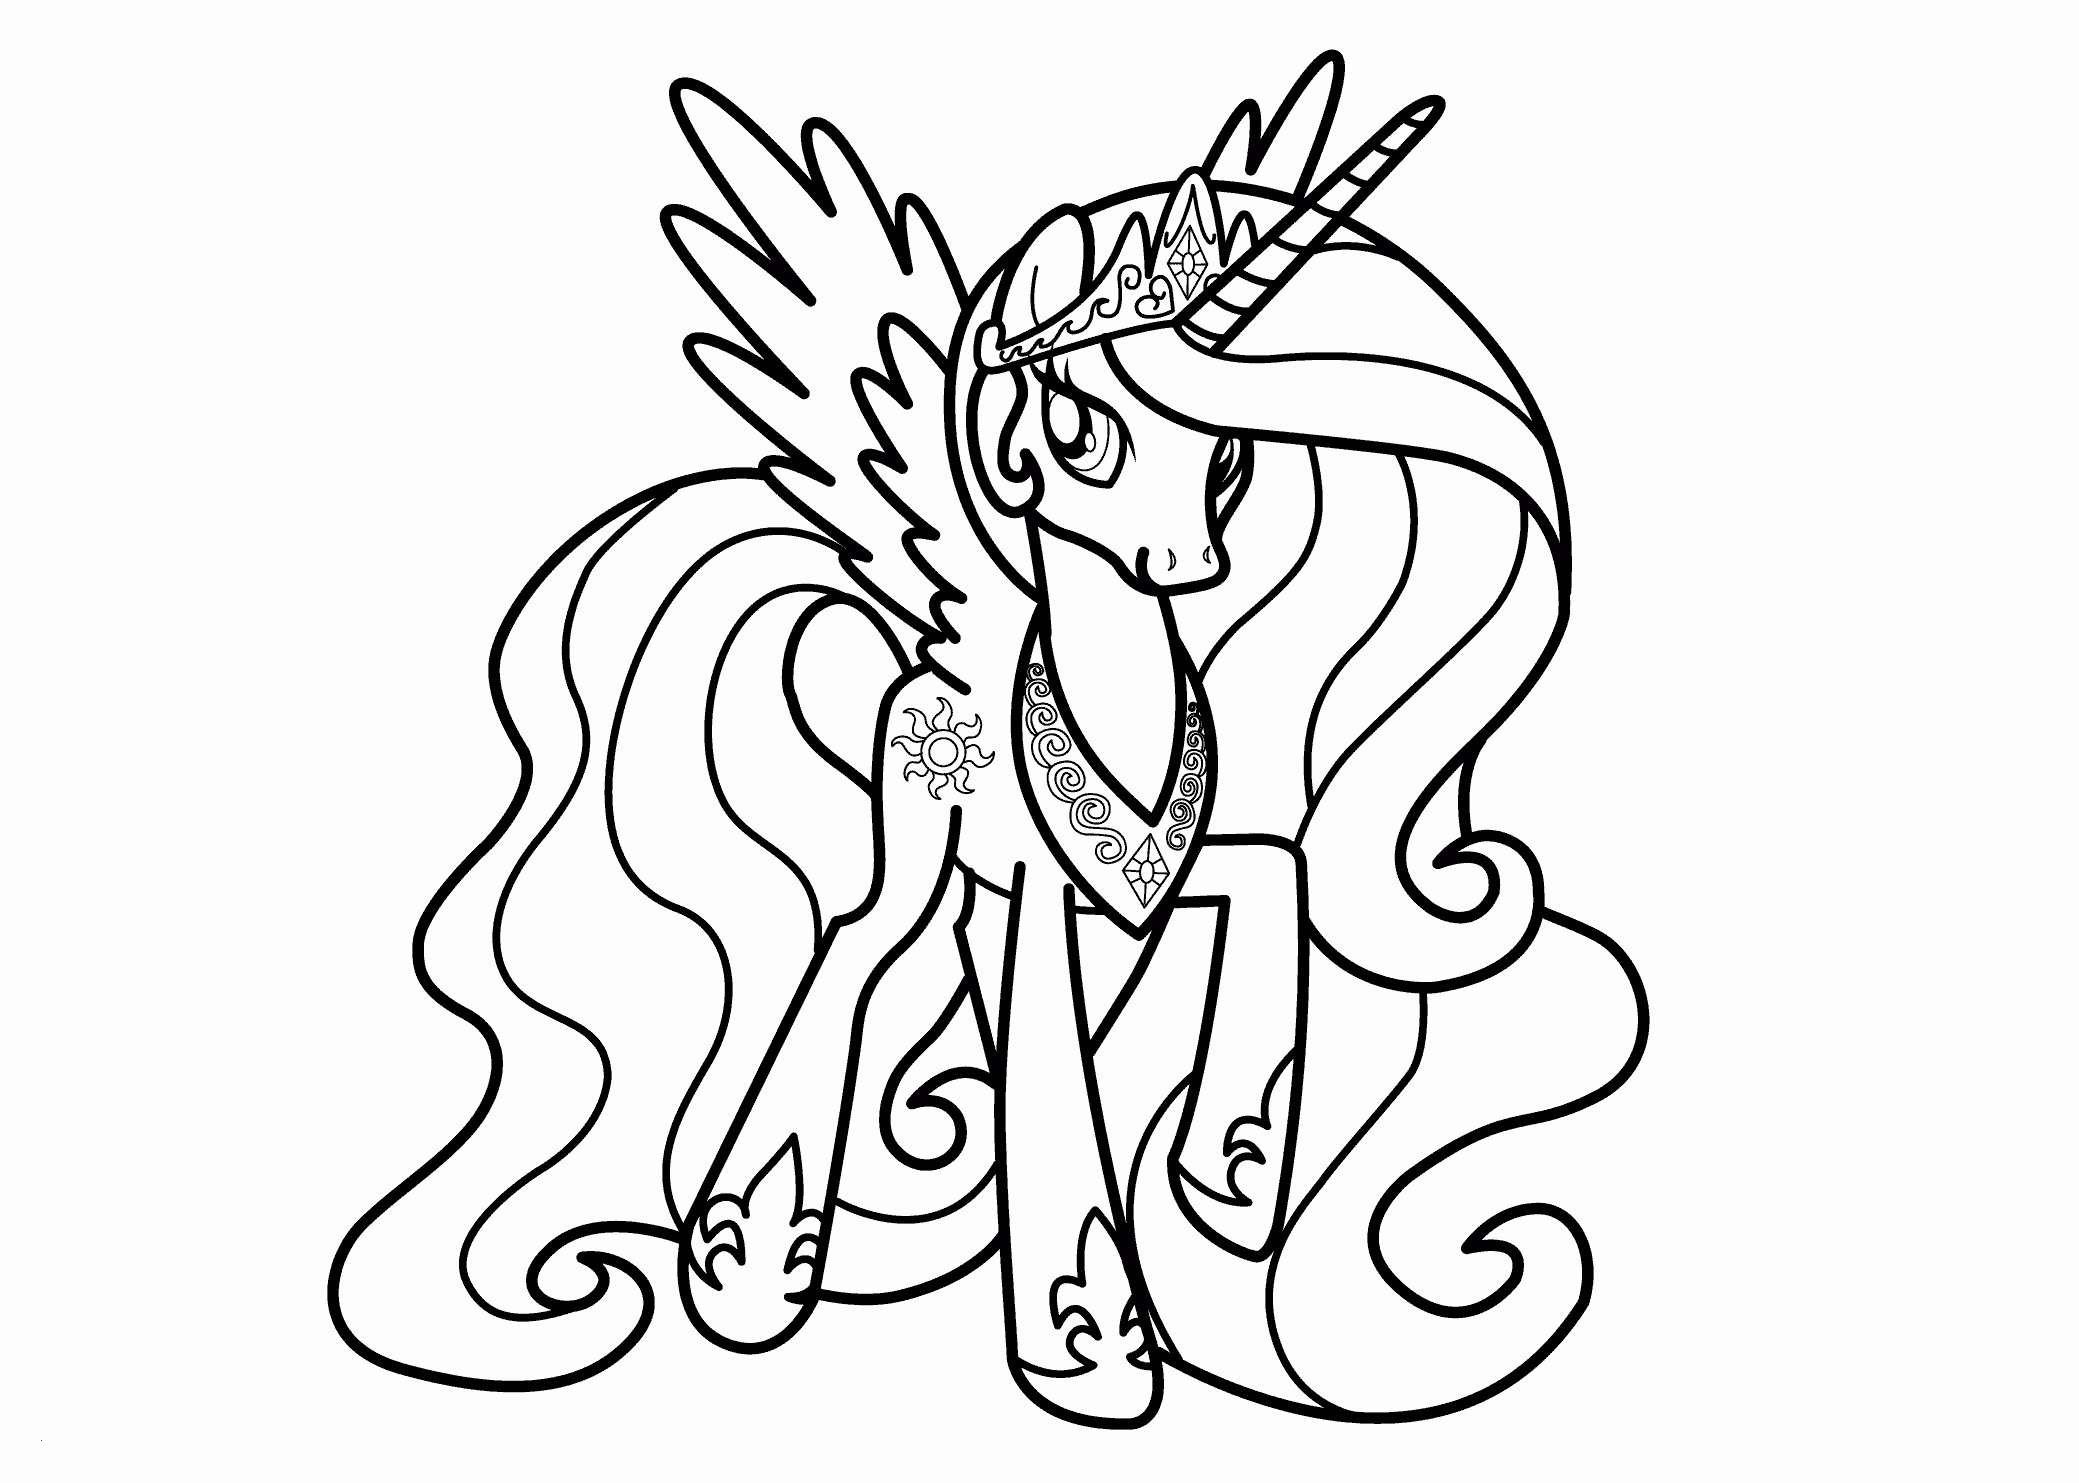 Malvorlagen My Little Pony Das Beste Von Baby Princess Celestia Coloring Page Free Coloring Sheets Elegant Fotografieren